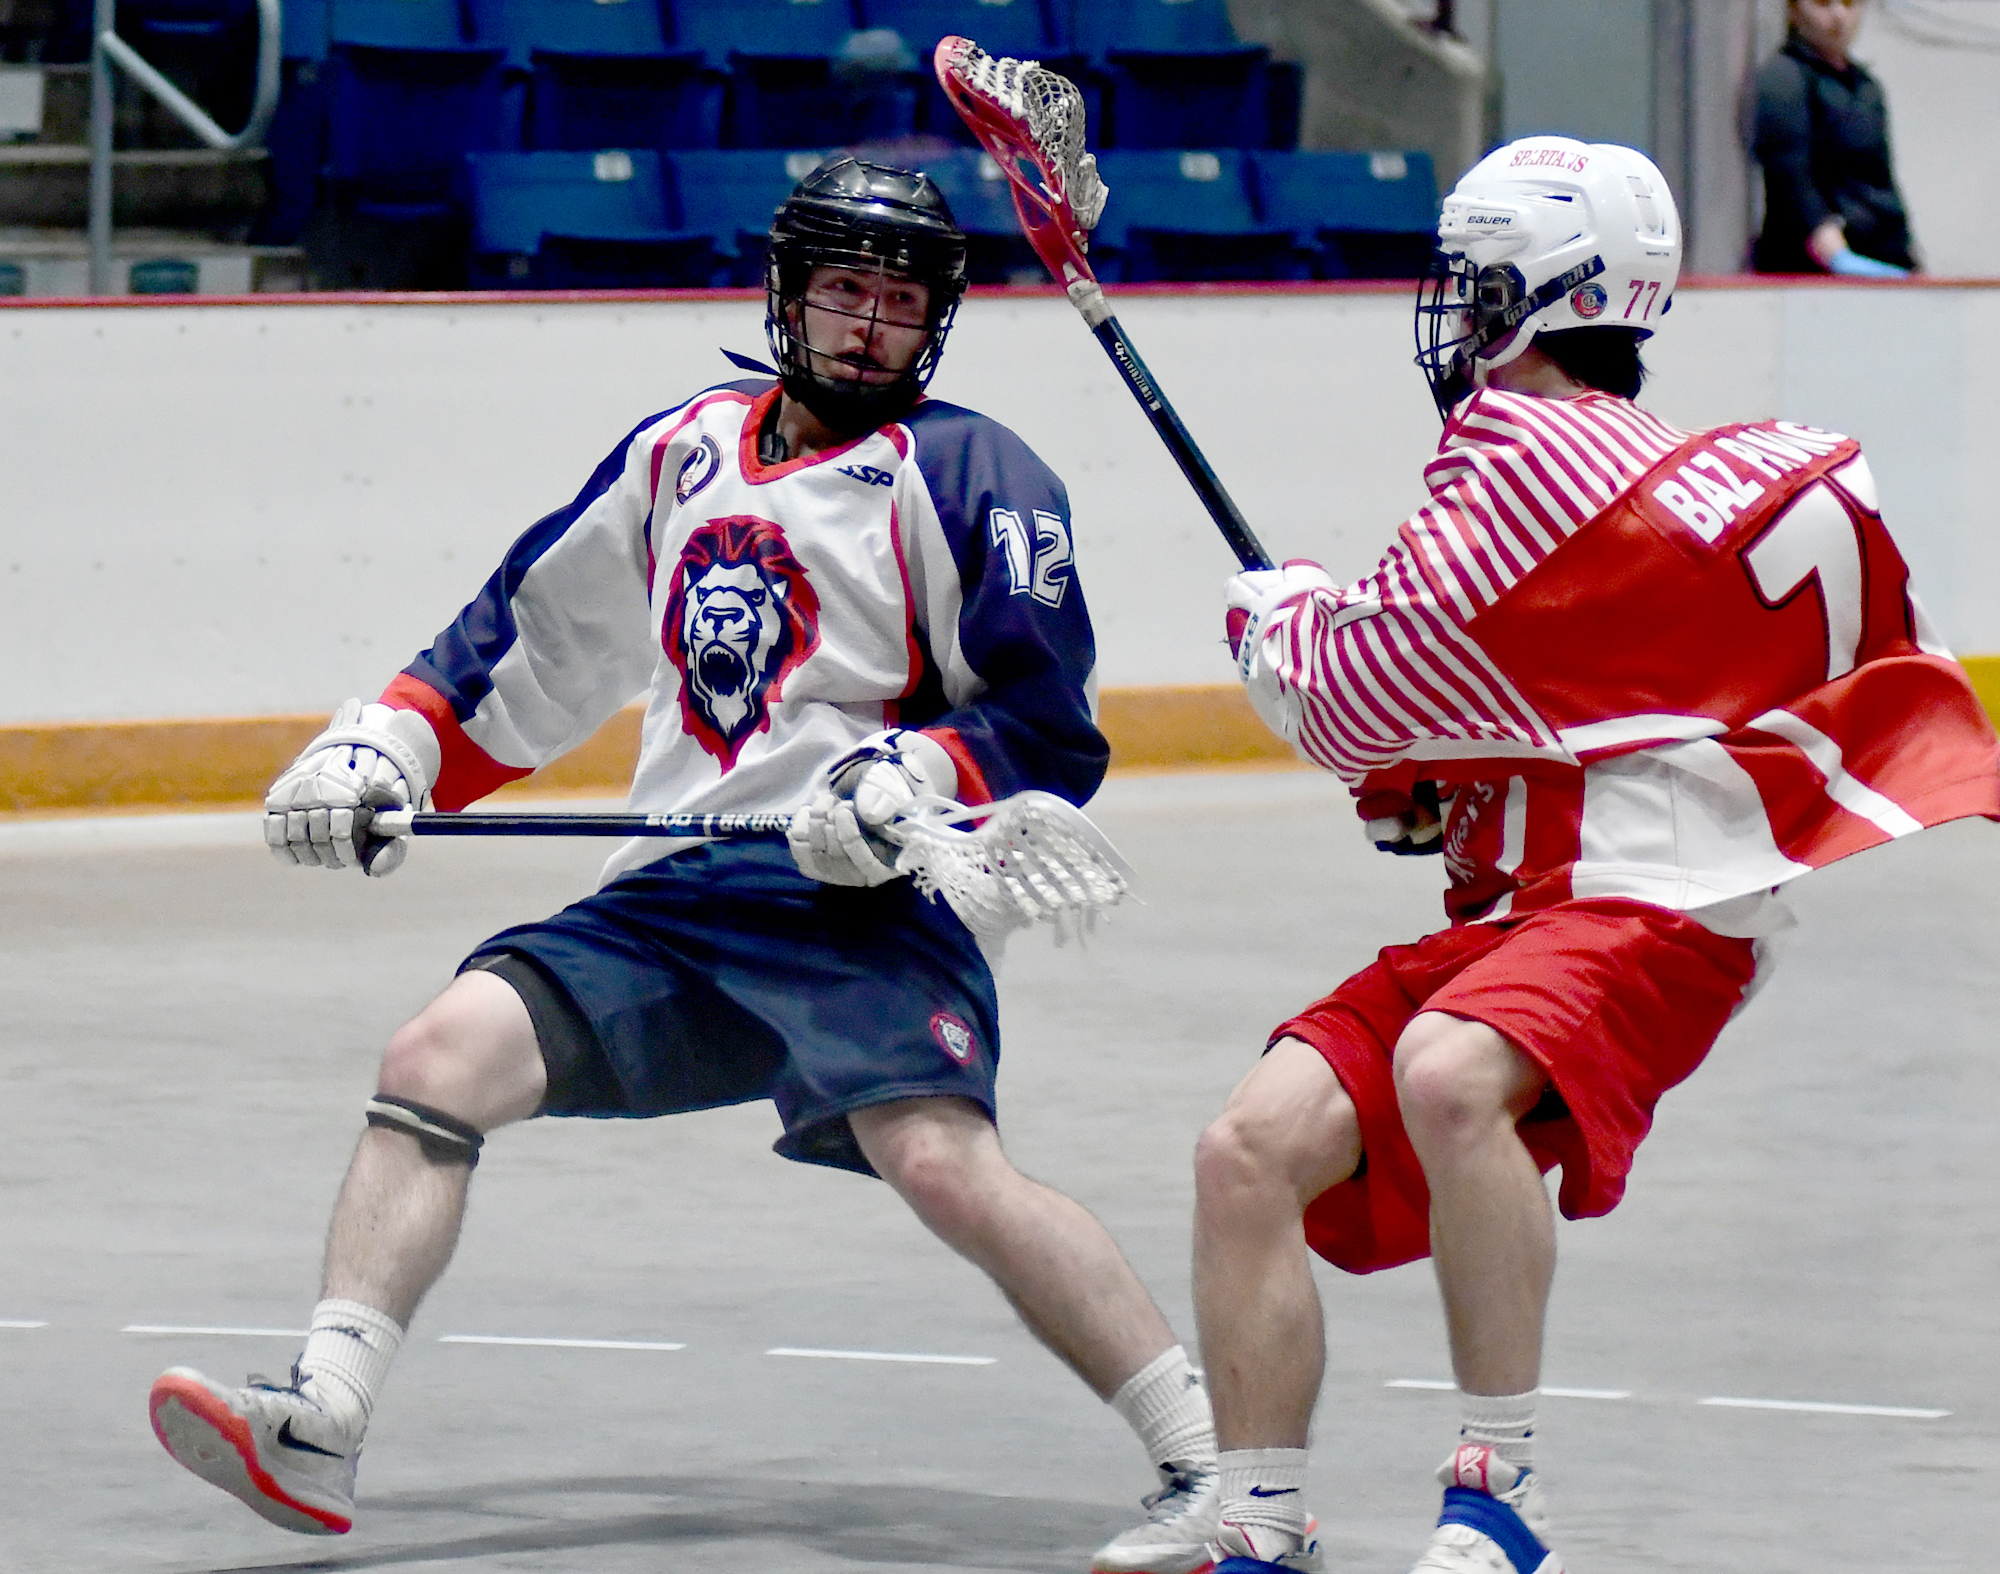 Consider, that Ontario midget lacrosse